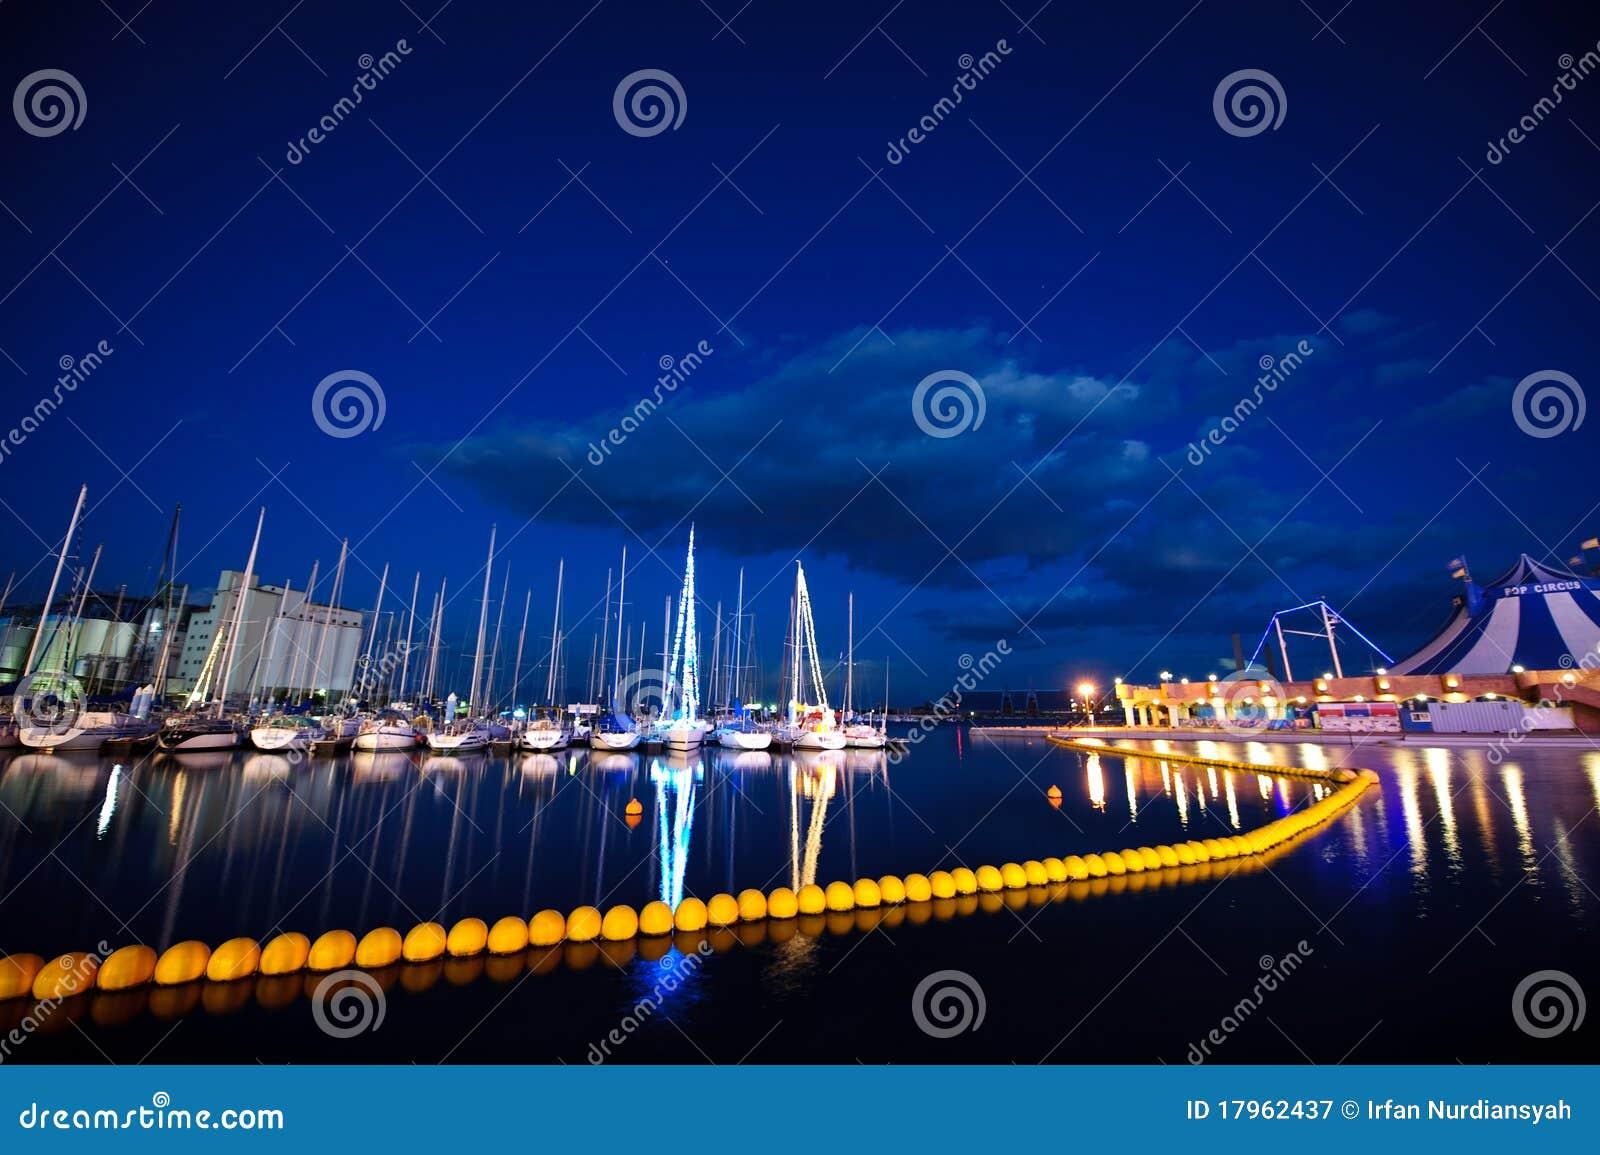 Docked yachts 04